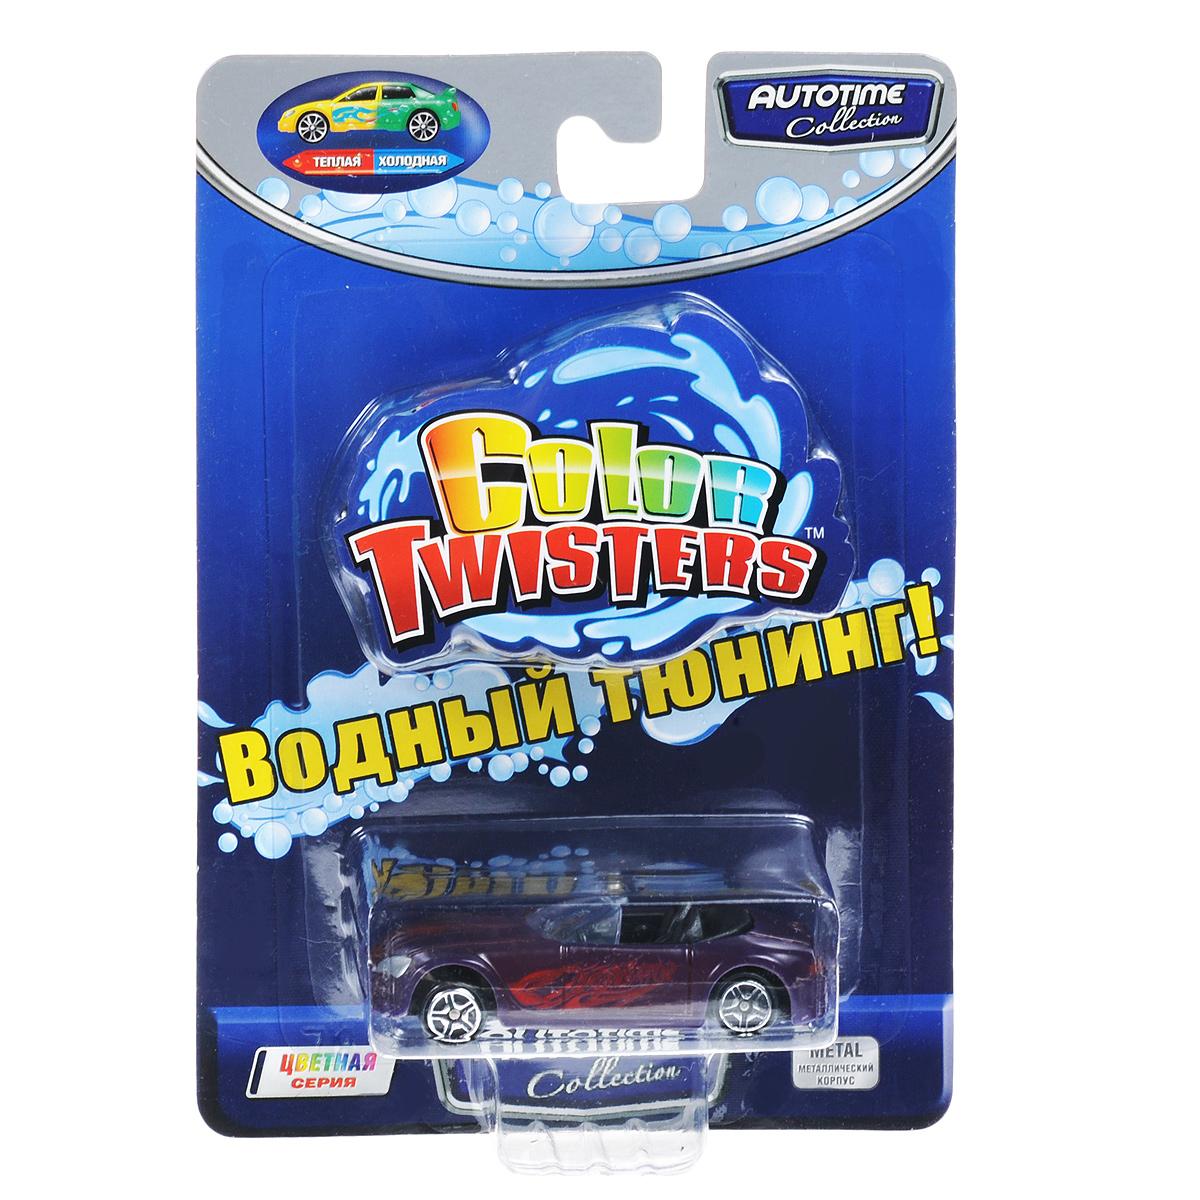 Autotime Машинка Color Twisters, цвет: бордовый машинки autotime машина uaz 31514 ваи